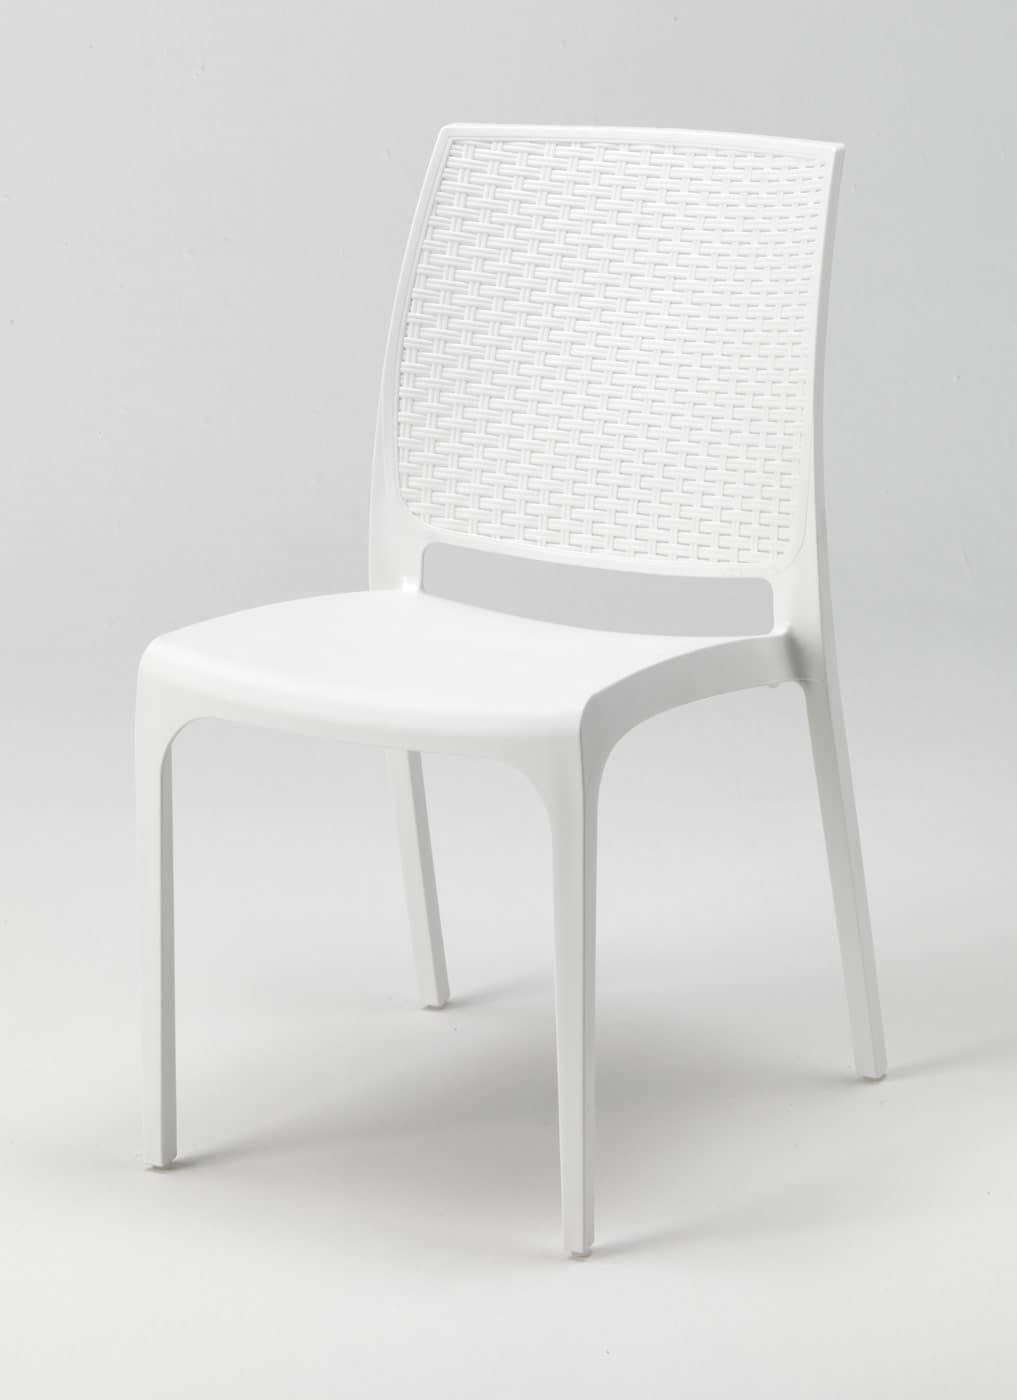 Sedia impilabile in plastica per esterni e giardini | IDFdesign